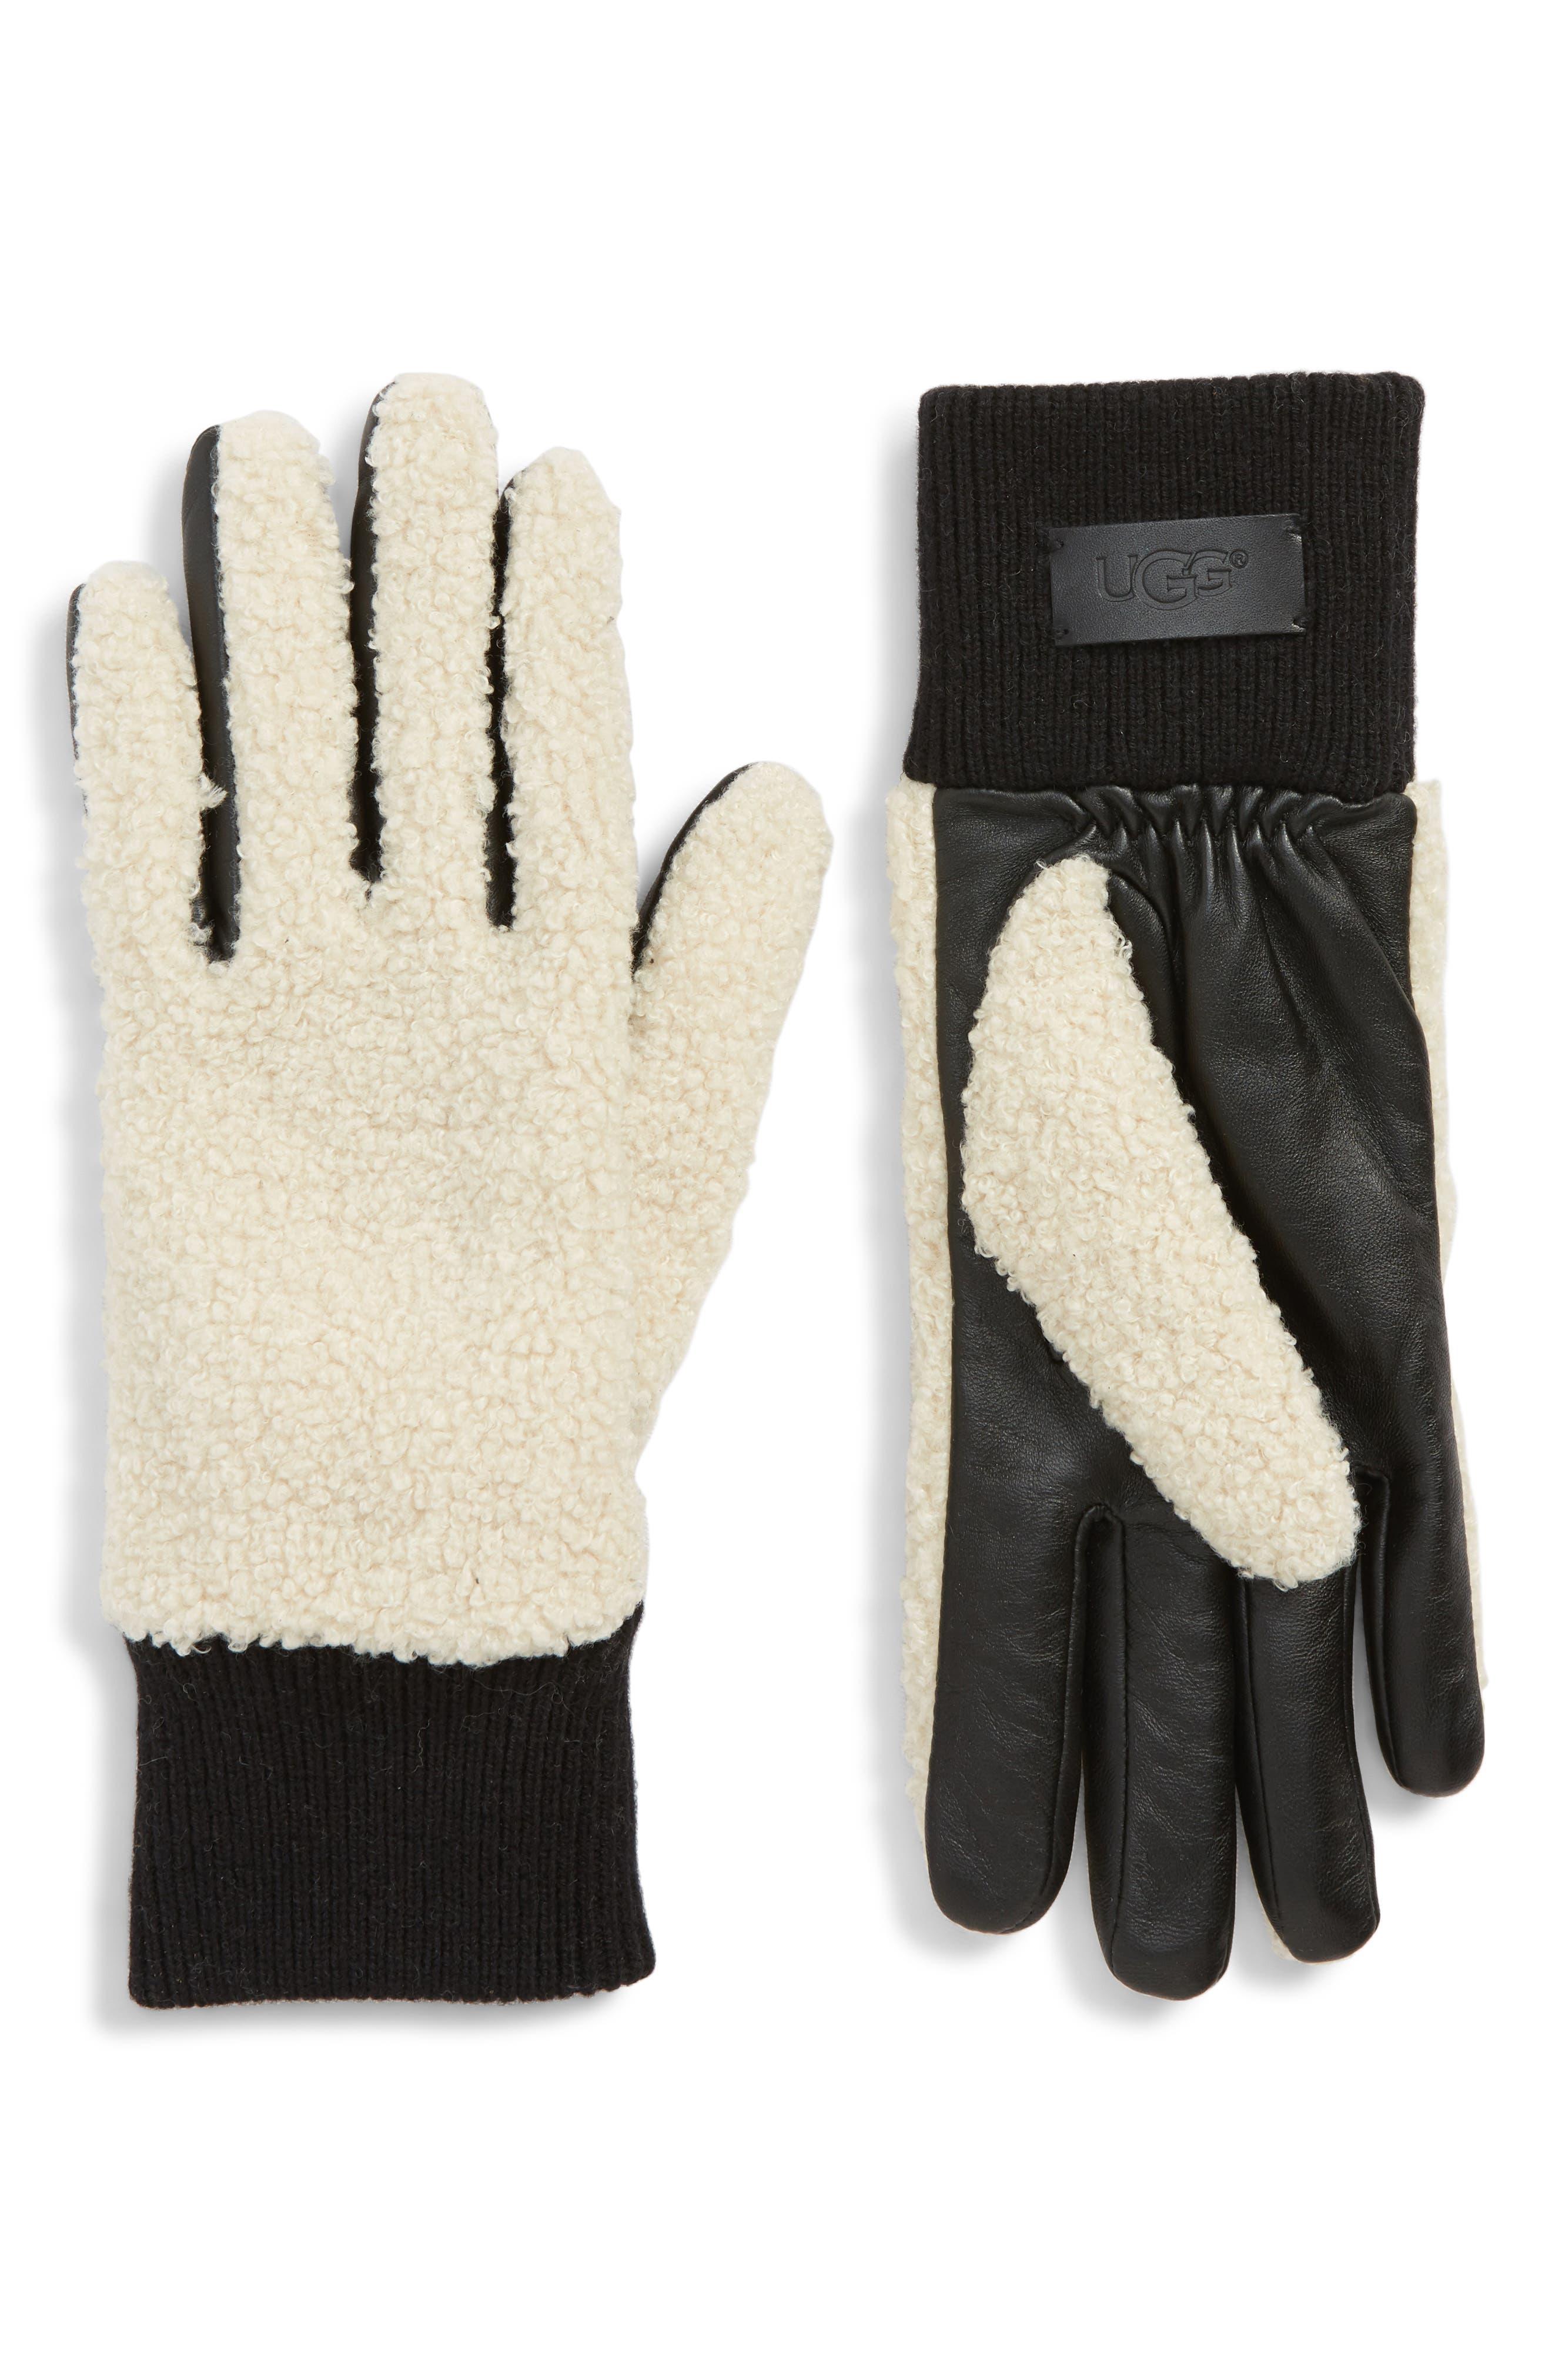 UGG<sup>®</sup> Faux Shearling Touchscreen Compatible Gloves,                             Main thumbnail 1, color,                             NATURAL